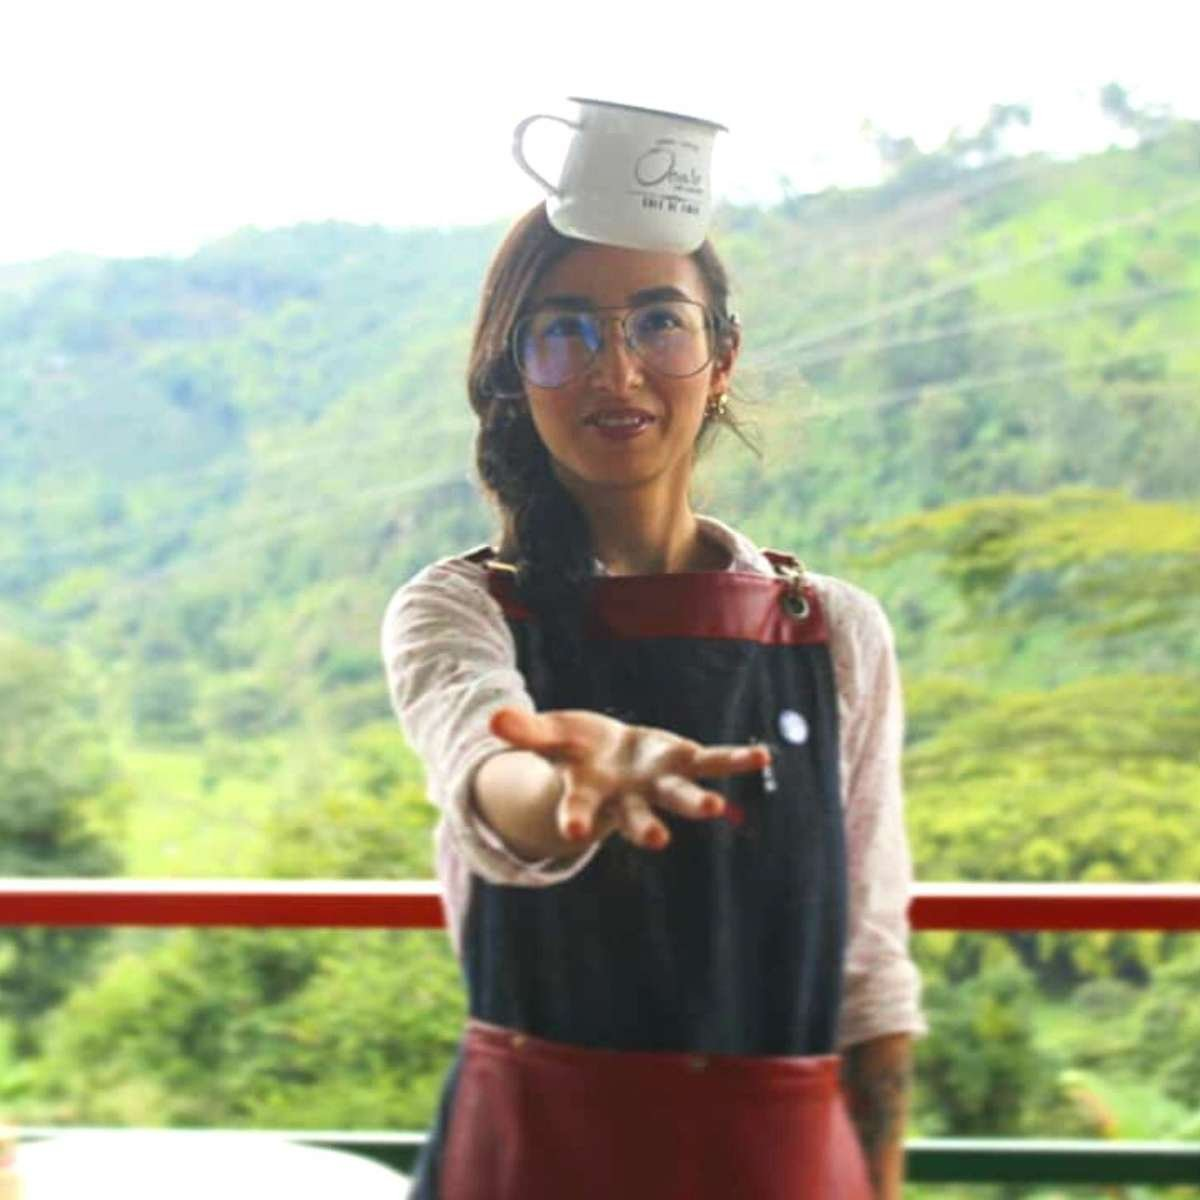 Frische Kaffee Bohnen aus Afrika, Ruanda.